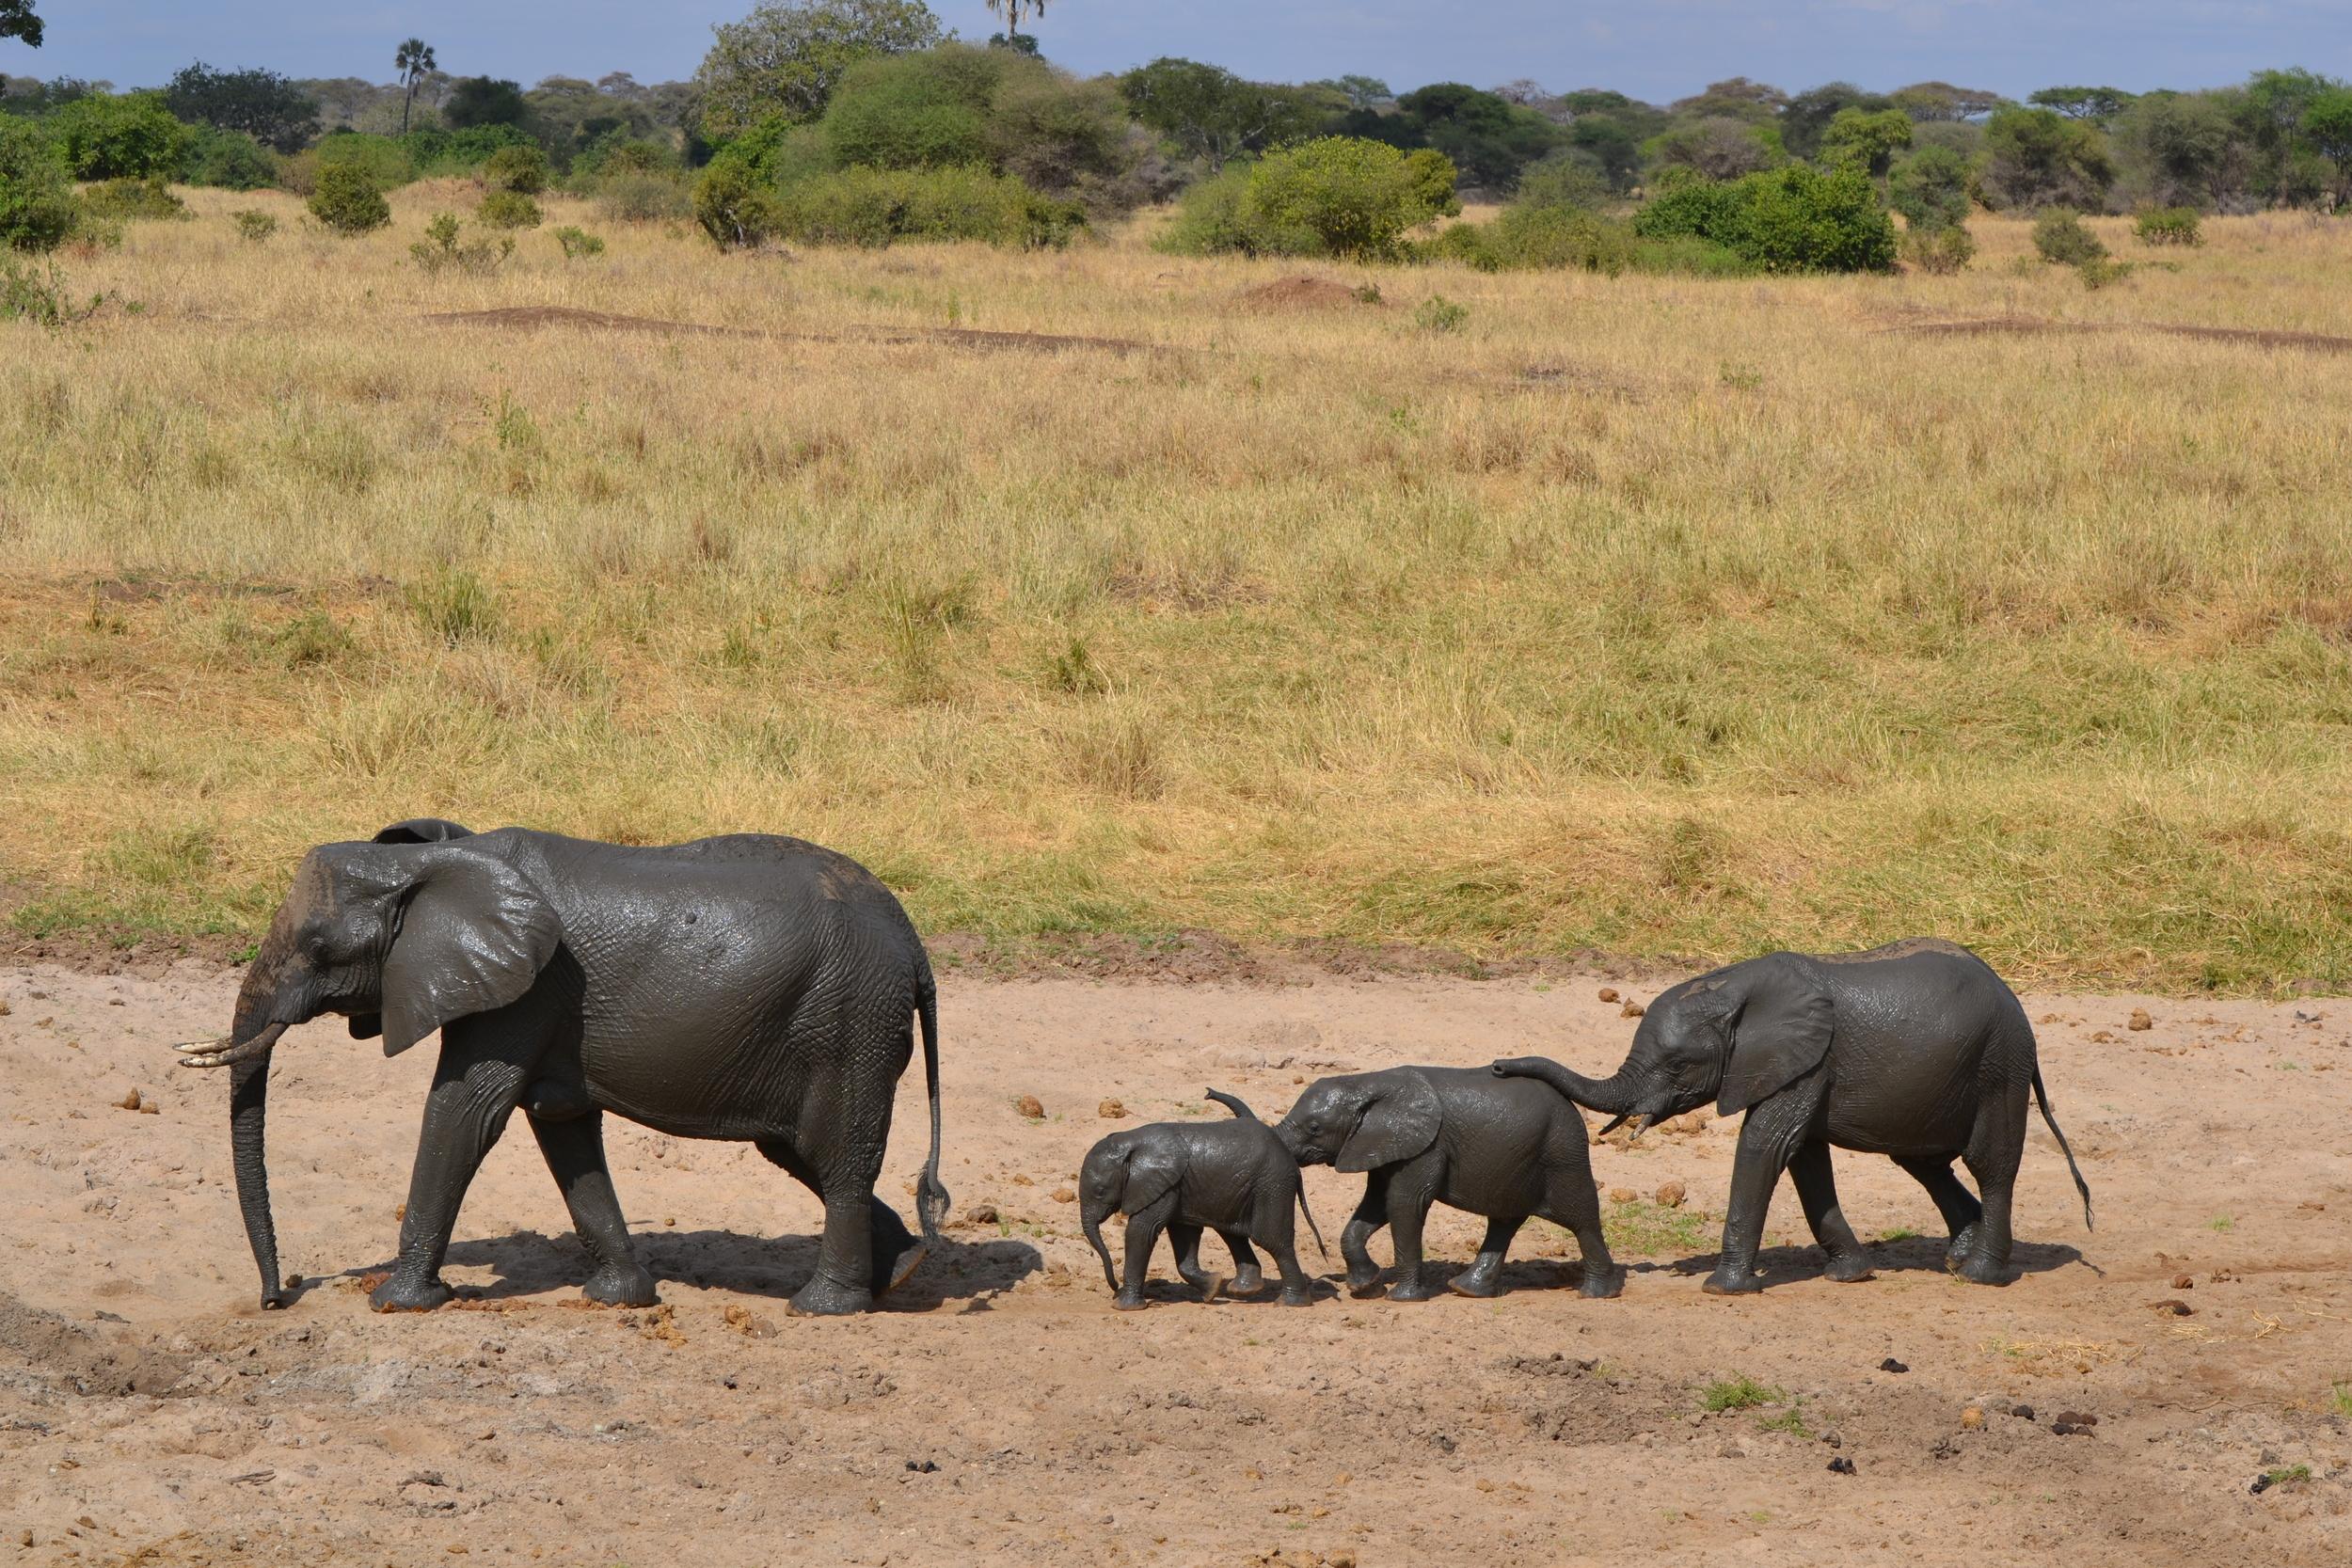 Elephant family on Safari after a nice mud bath.